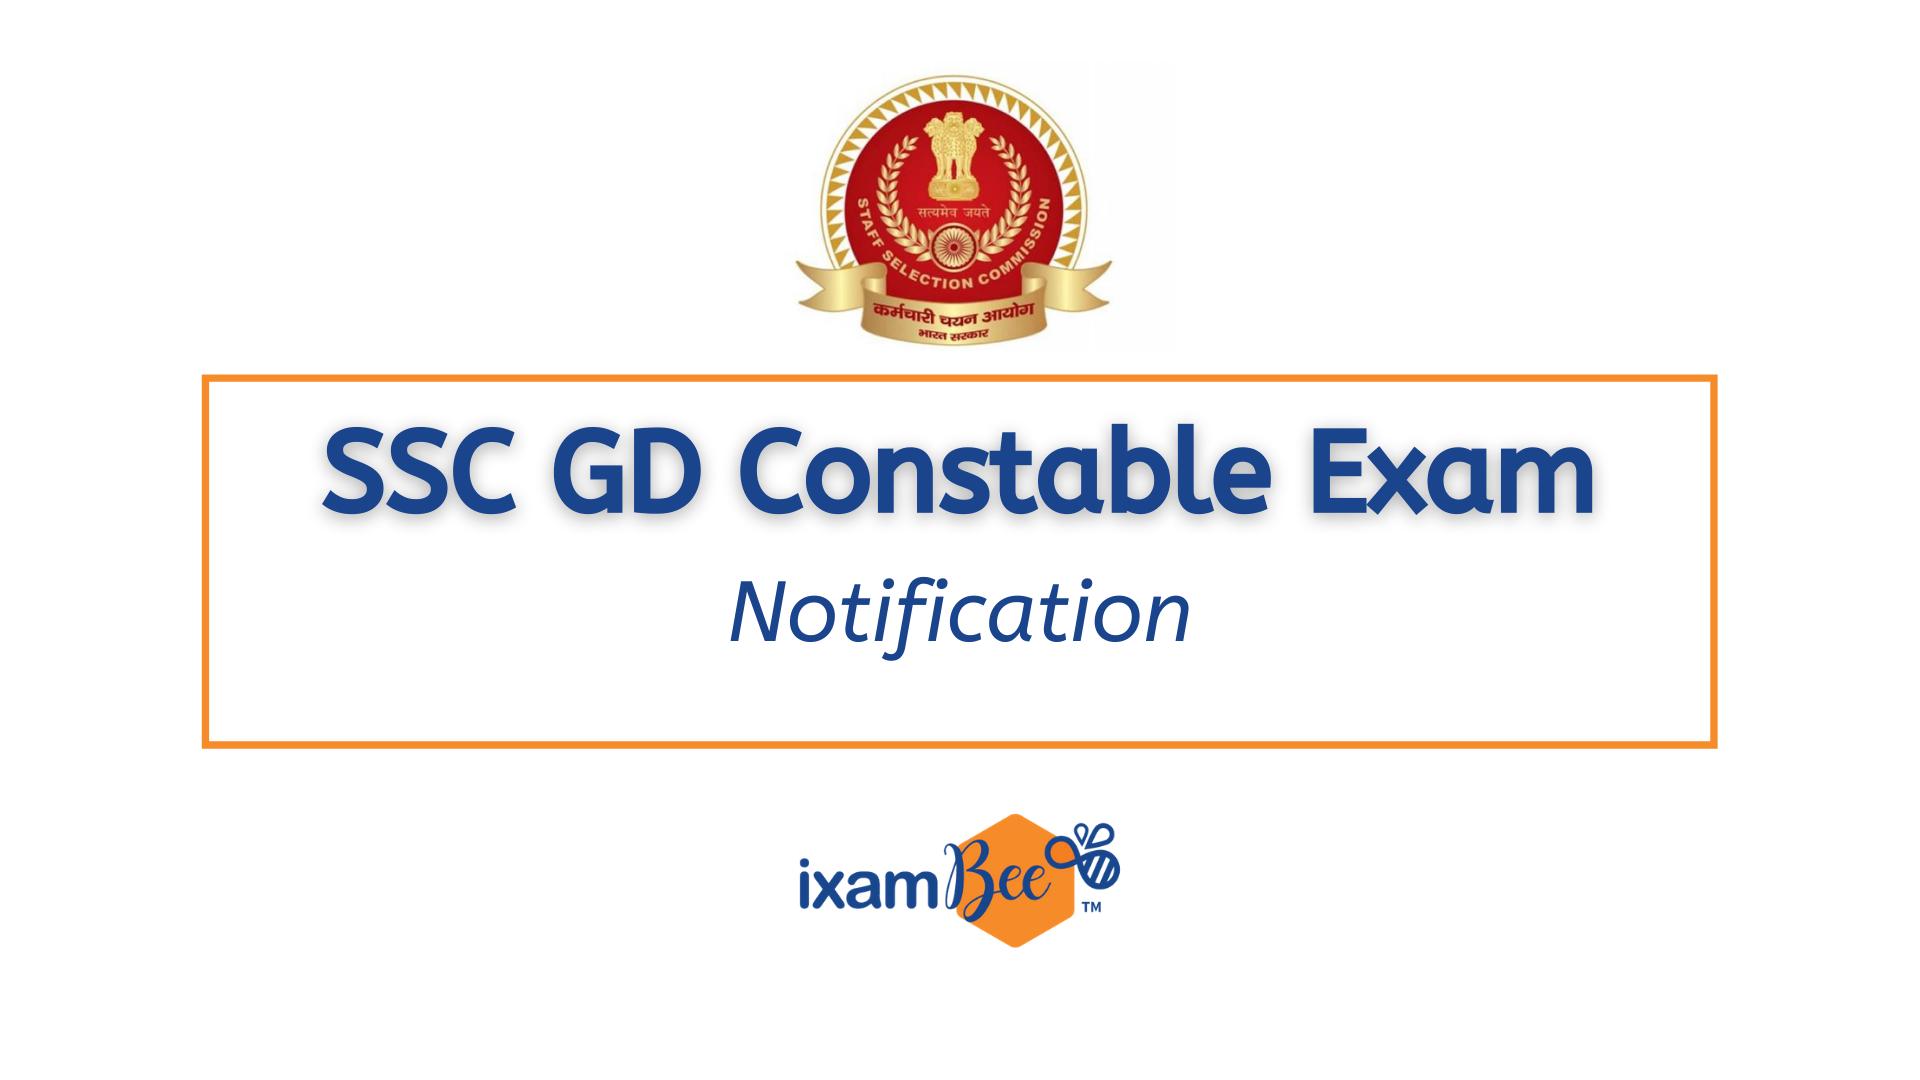 SSC GD Constable Exam Notification